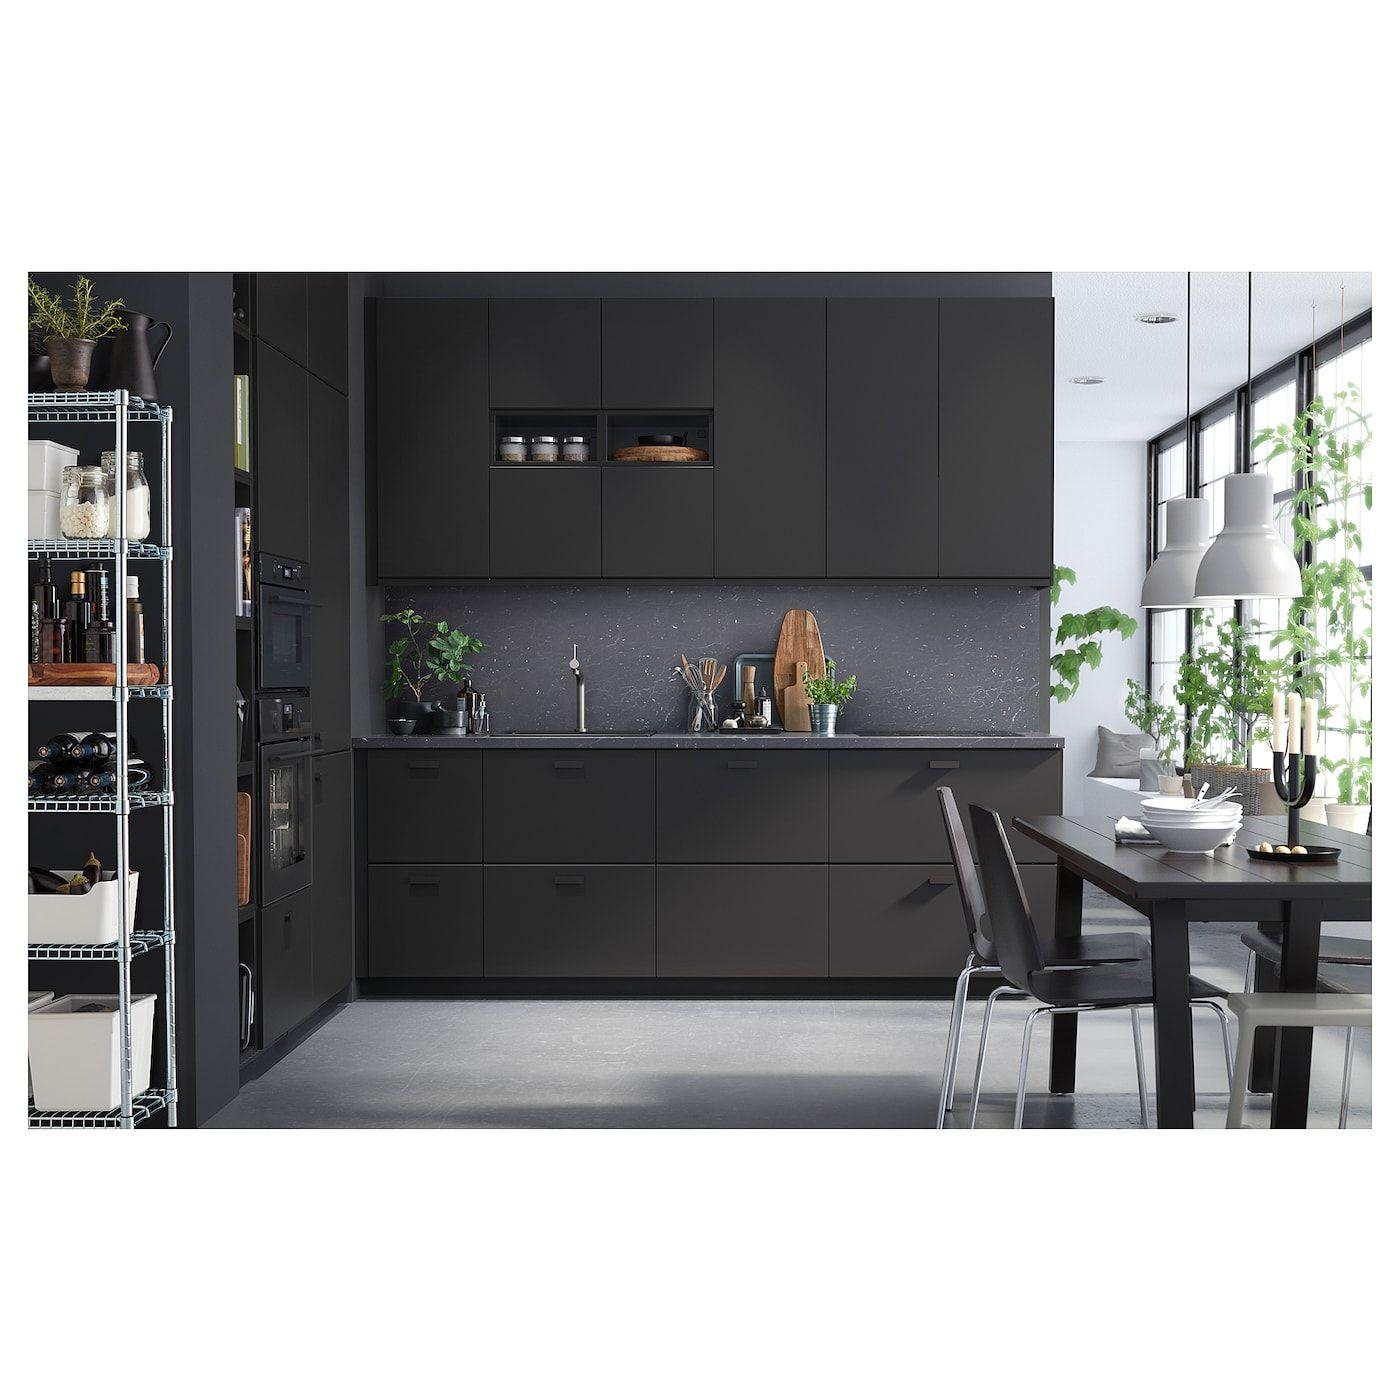 Saljan Countertop Black Marble Effect Laminate 98x1 1 2 Ikea In 2020 Kitchen Cabinet Remodel Black Ikea Kitchen Grey Kitchen Designs